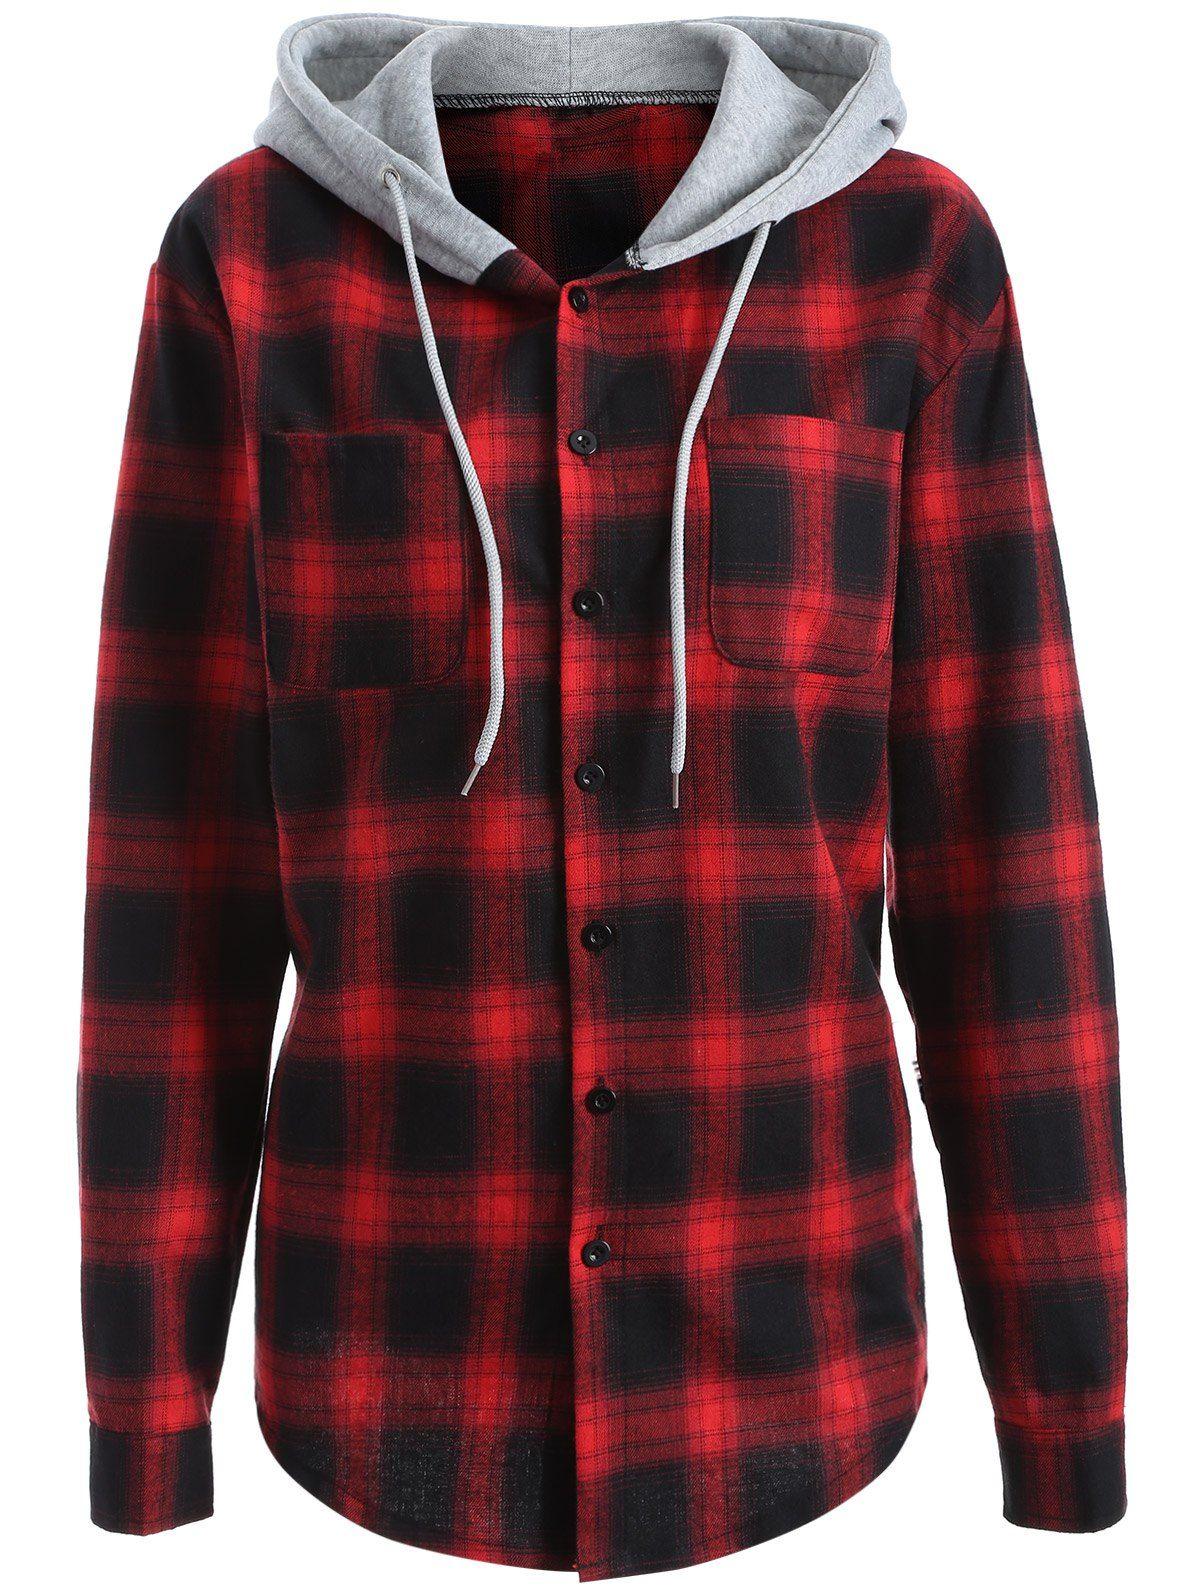 Plaid Flannel Hoodie Shirts Flannel Hoodie Flannel Jacket Women S [ 1596 x 1200 Pixel ]